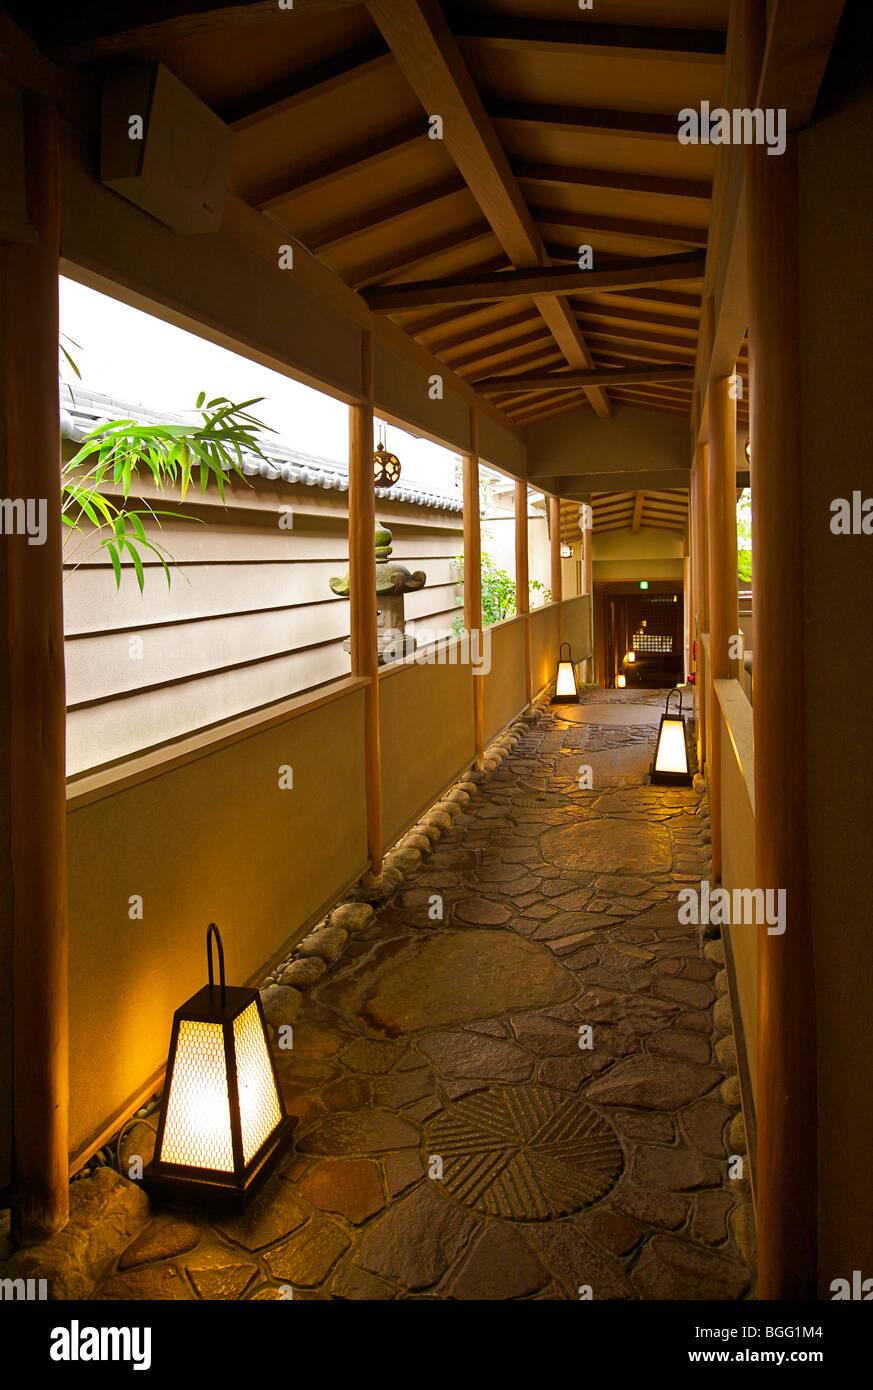 Gion Hatanaka. Japanese ryokan. Corridor. A traditional style guest house. Kyoto, Japan - Stock Image